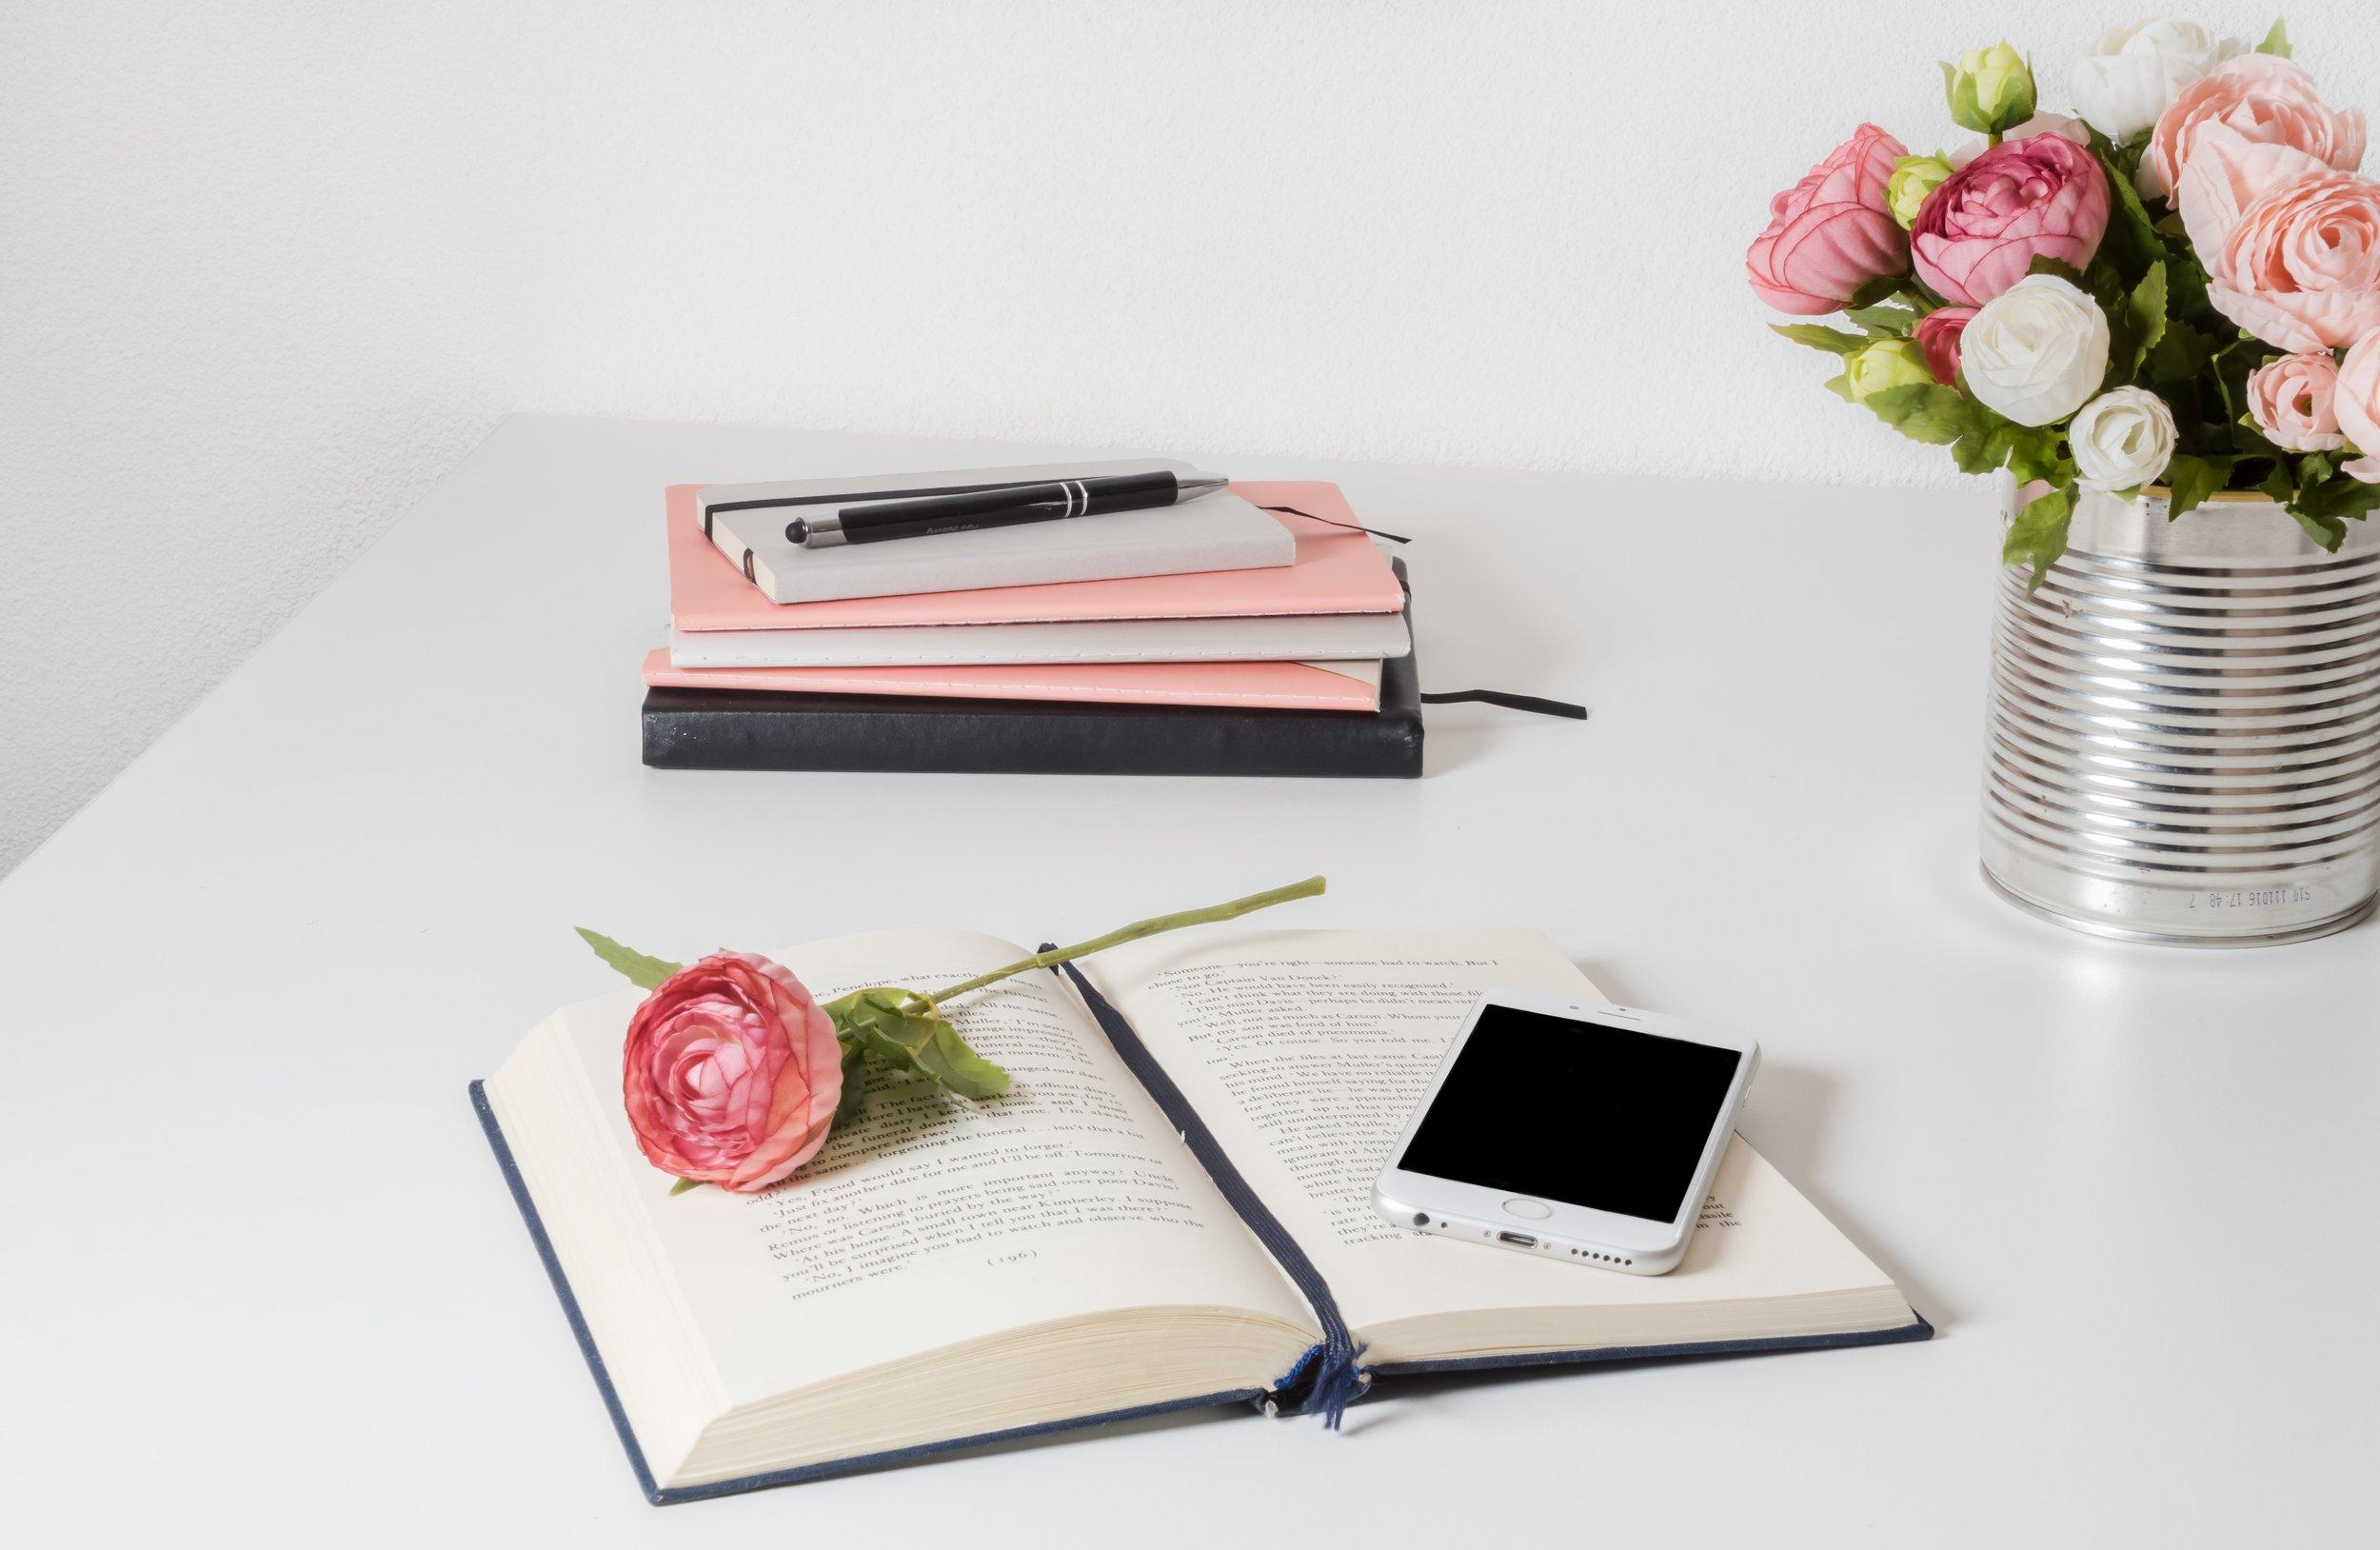 background-books-business-1809340.jpg